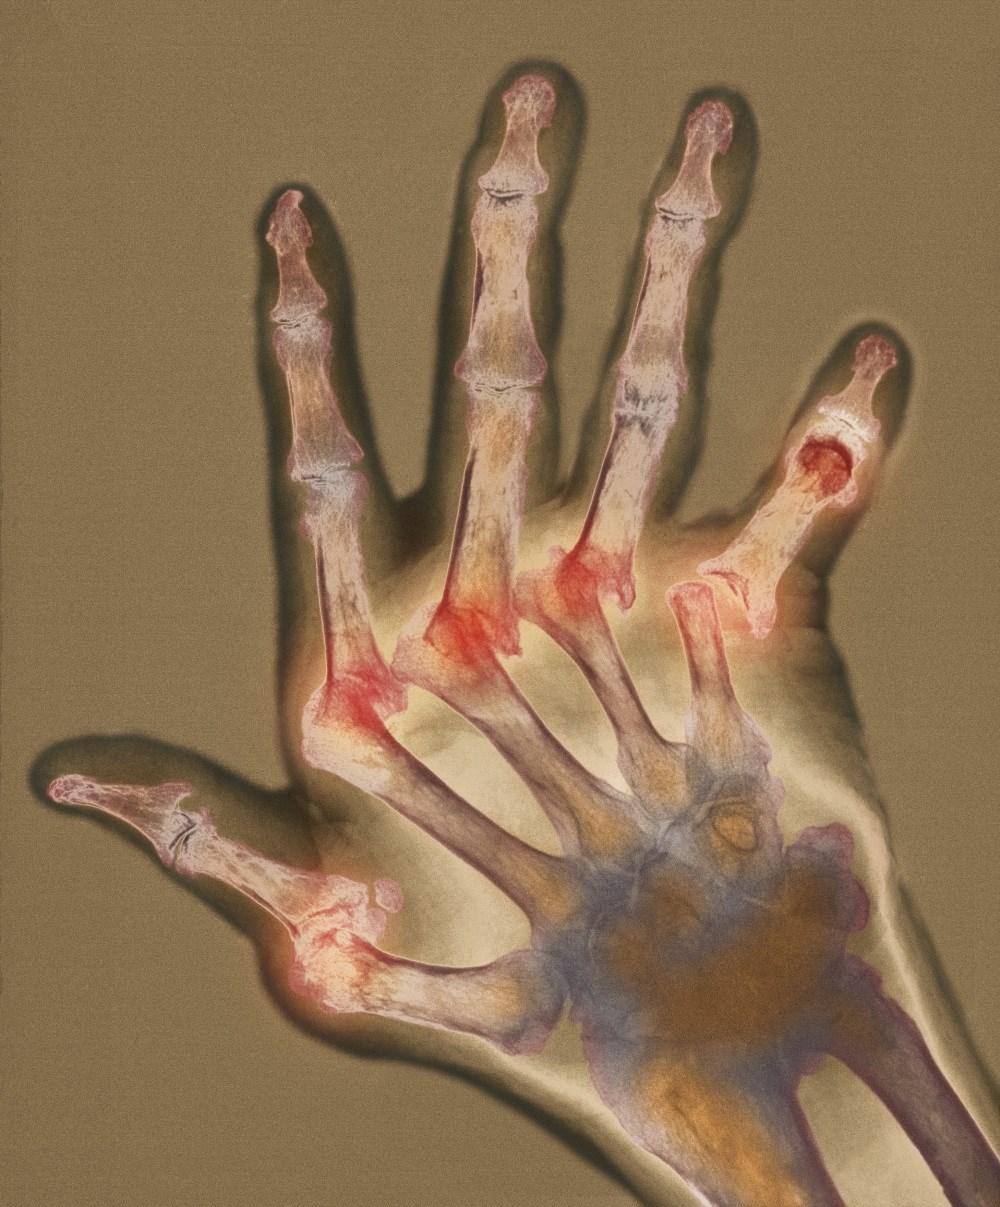 Secukinumab Improves Symptoms in TNFi-Refractory Rheumatoid Arthritis